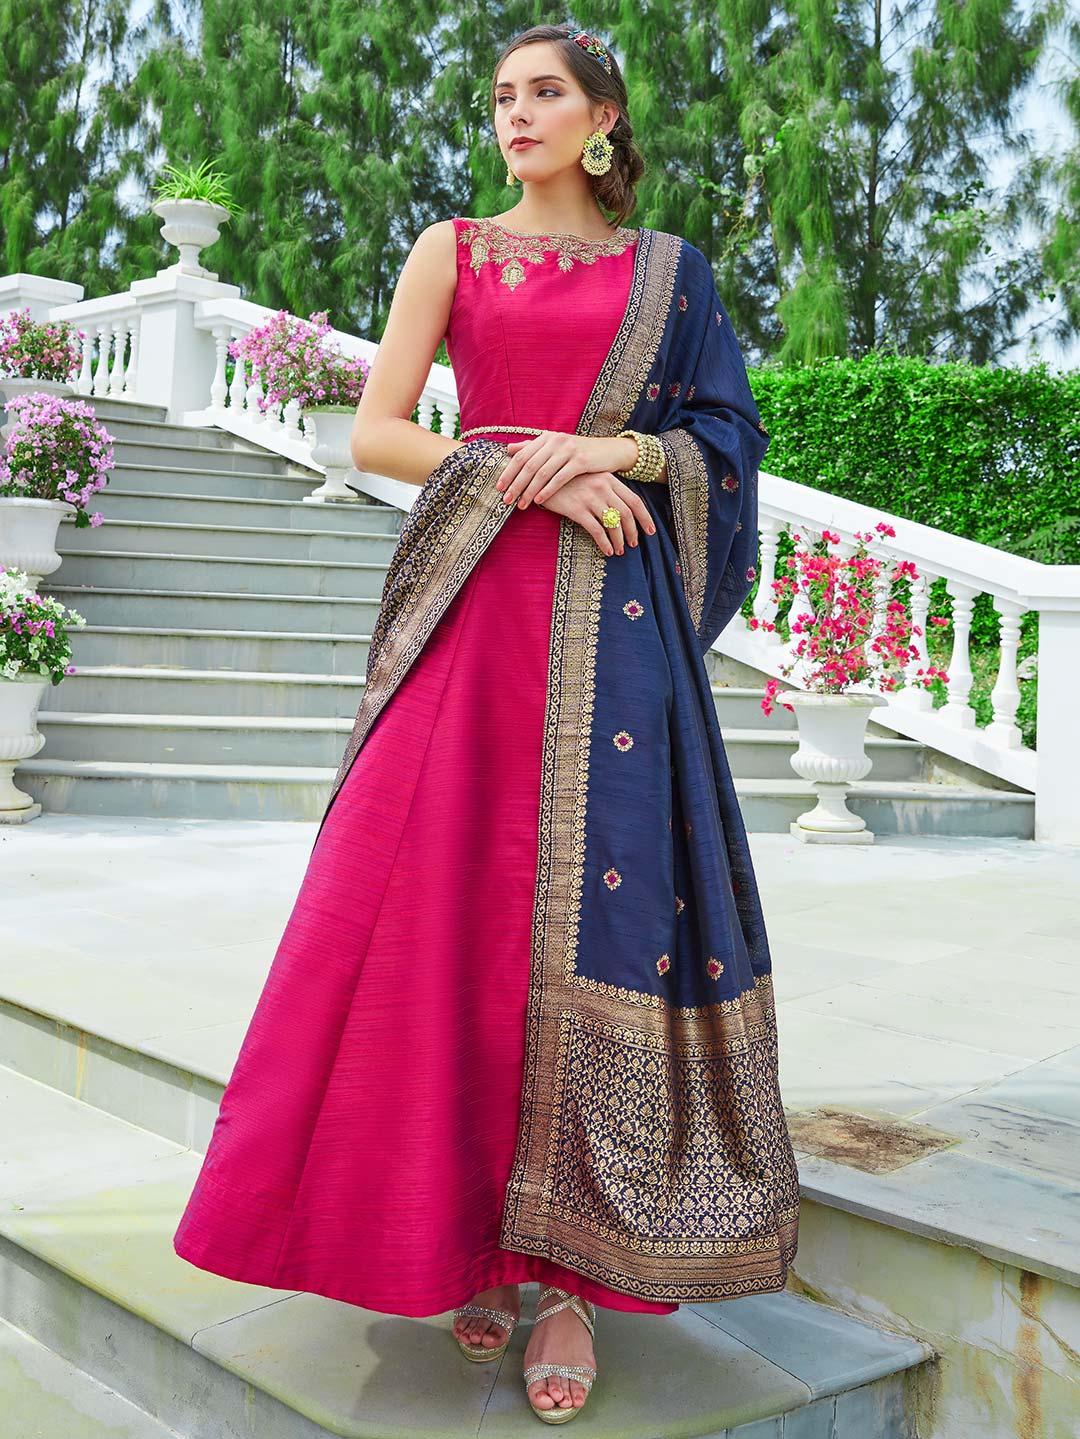 955020f097 Lovely magenta hue raw silk anarkali suit - G3-WSS14139 | G3fashion ...